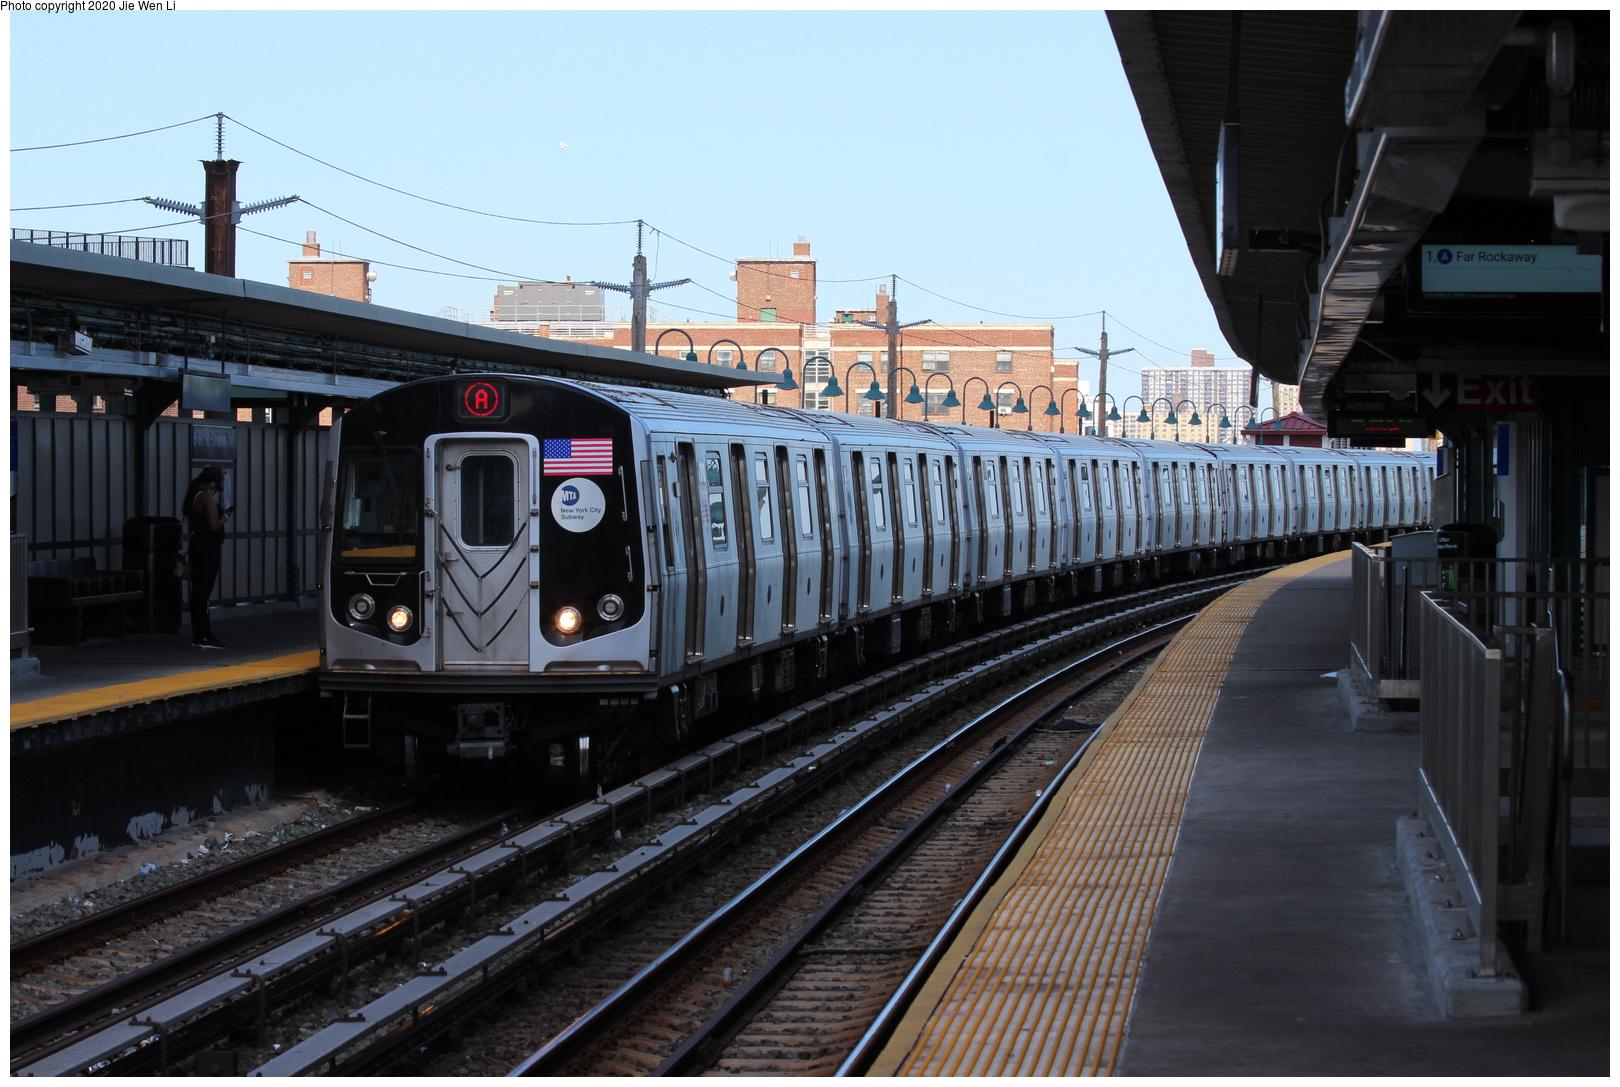 (201k, 1044x988)<br><b>Country:</b> United States<br><b>City:</b> New York<br><b>System:</b> New York City Transit<br><b>Line:</b> IND Fulton Street Line<br><b>Location:</b> Lefferts Boulevard <br><b>Car:</b> BMT C  <br><b>Photo by:</b> Joel Shanus<br><b>Notes:</b> Maybe Rockaway Ave./Fulton line?<br><b>Viewed (this week/total):</b> 0 / 2221